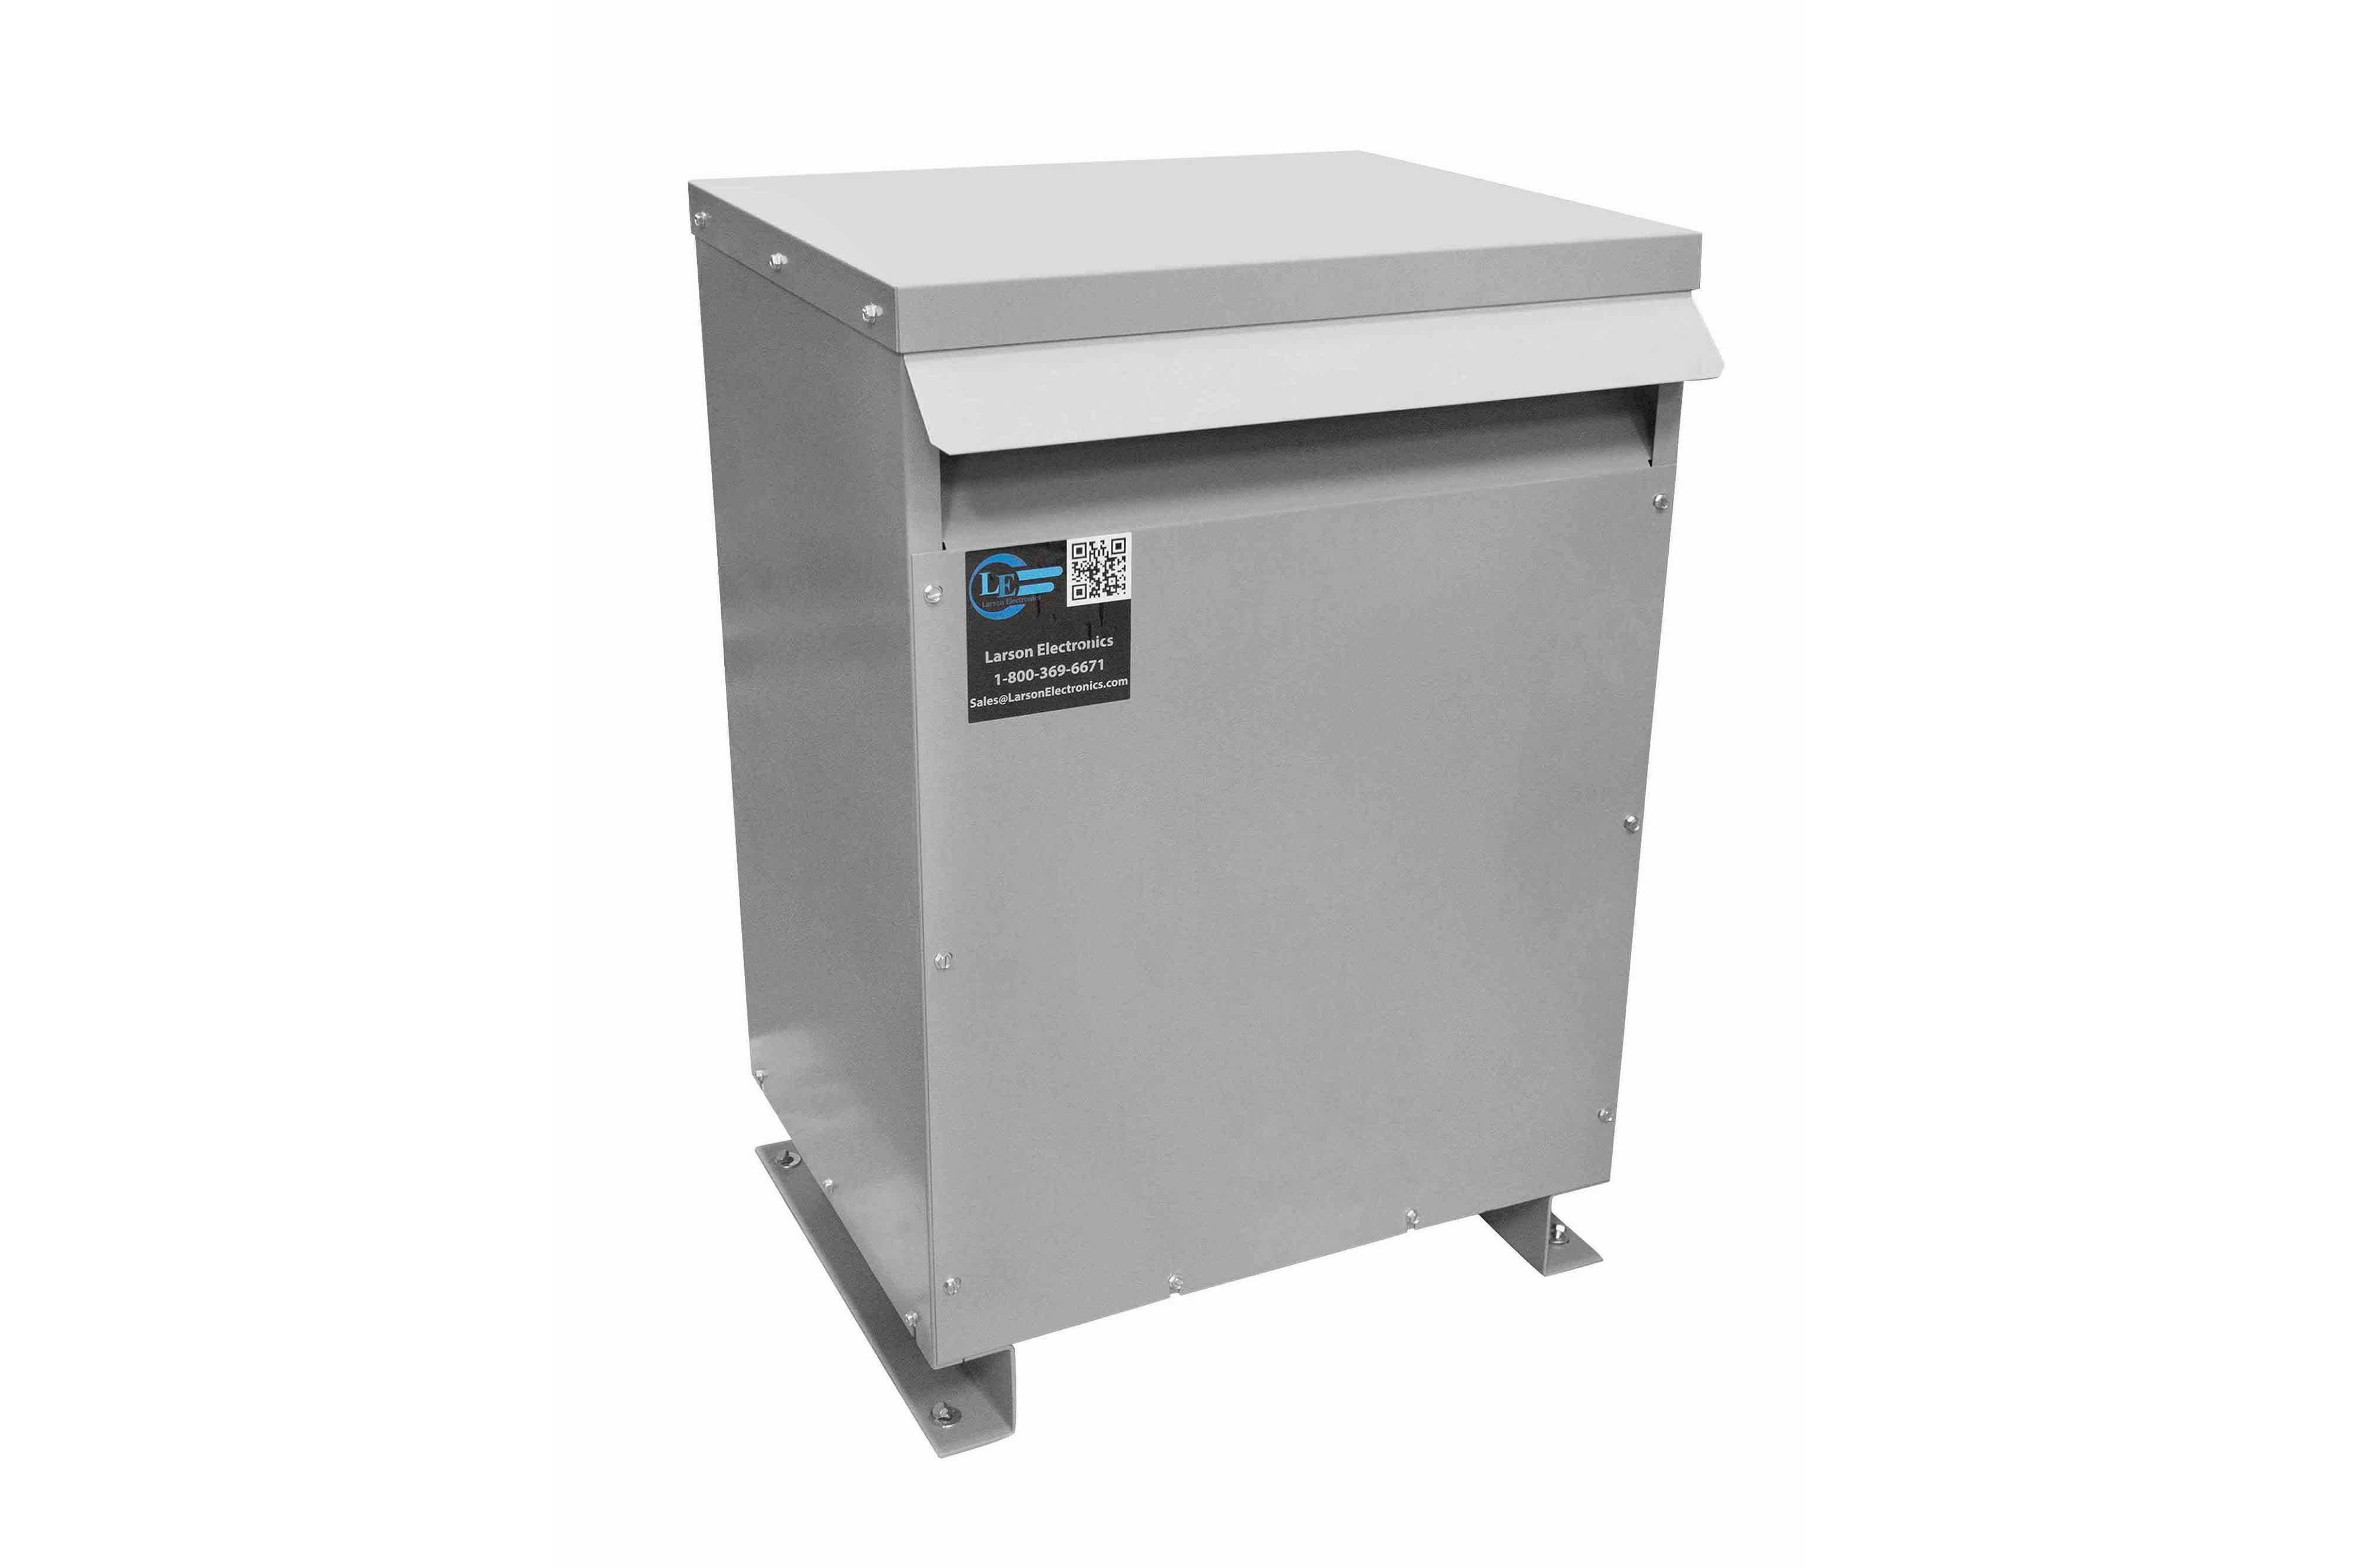 10 kVA 3PH Isolation Transformer, 600V Wye Primary, 480V Delta Secondary, N3R, Ventilated, 60 Hz